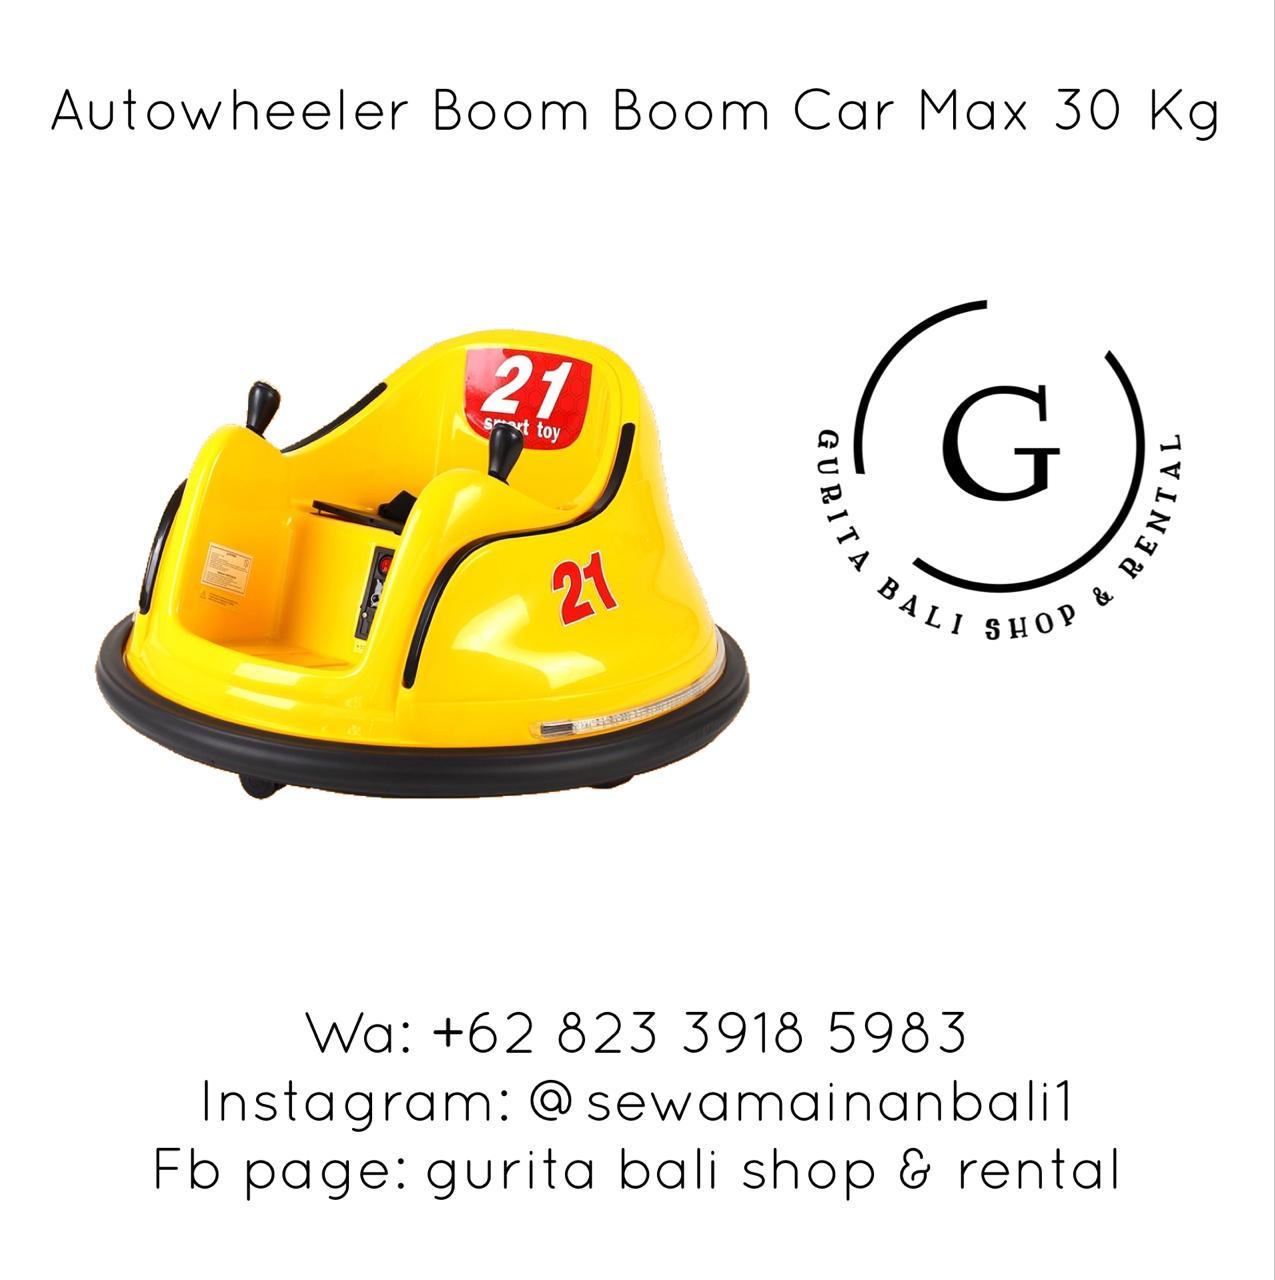 AUTOWHEELER BOOM BOOM CAR 2